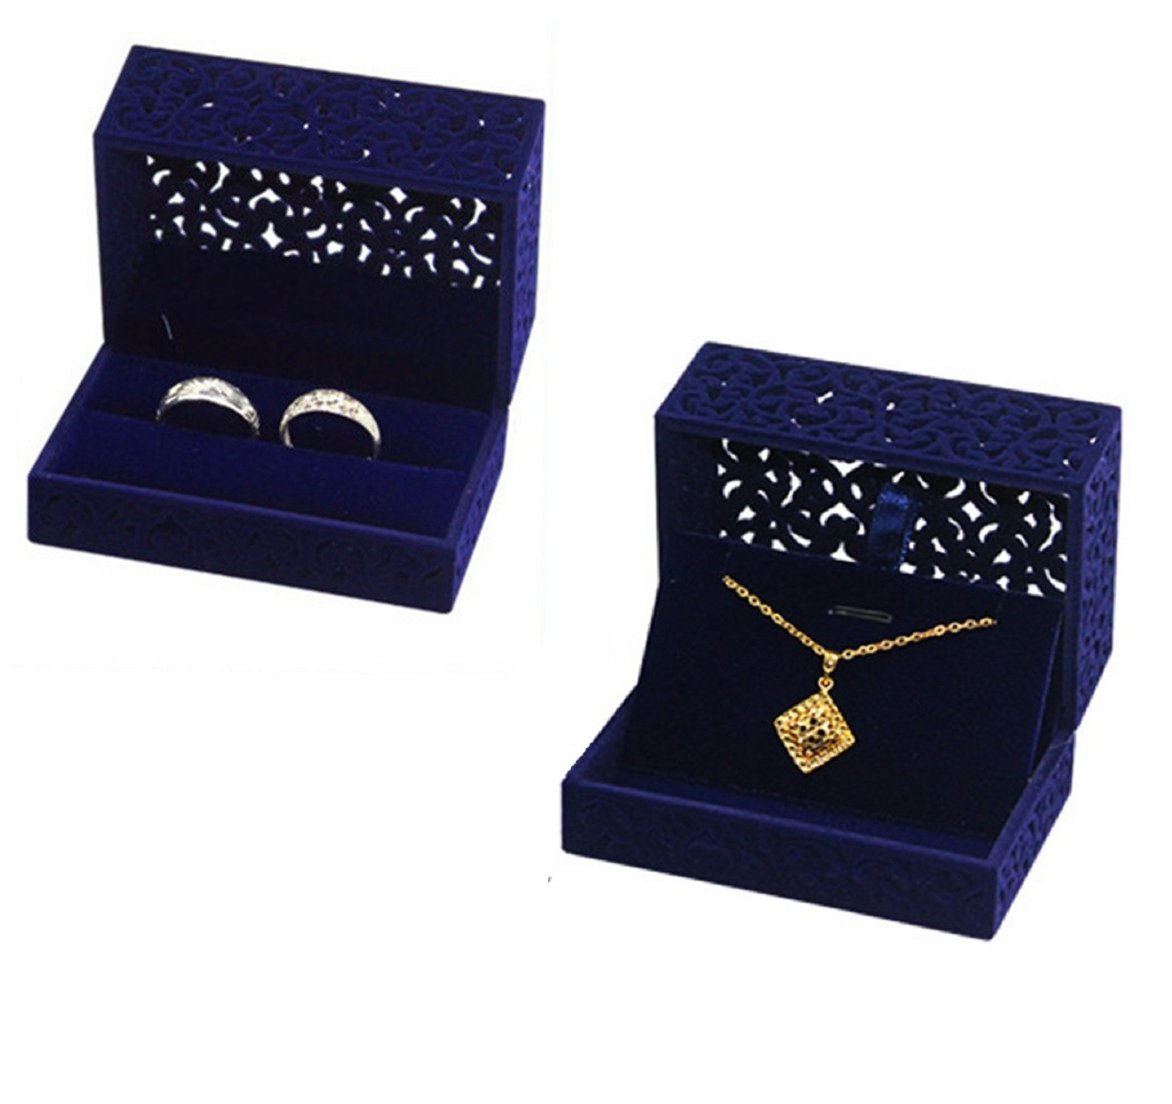 FUTISKY Velvet Ring Box Necklace Box Set, Navy Blue Hollow Jewelry Storage Box Double Ring Engagement Wedding Gift (Ring & Necklace Box Set)